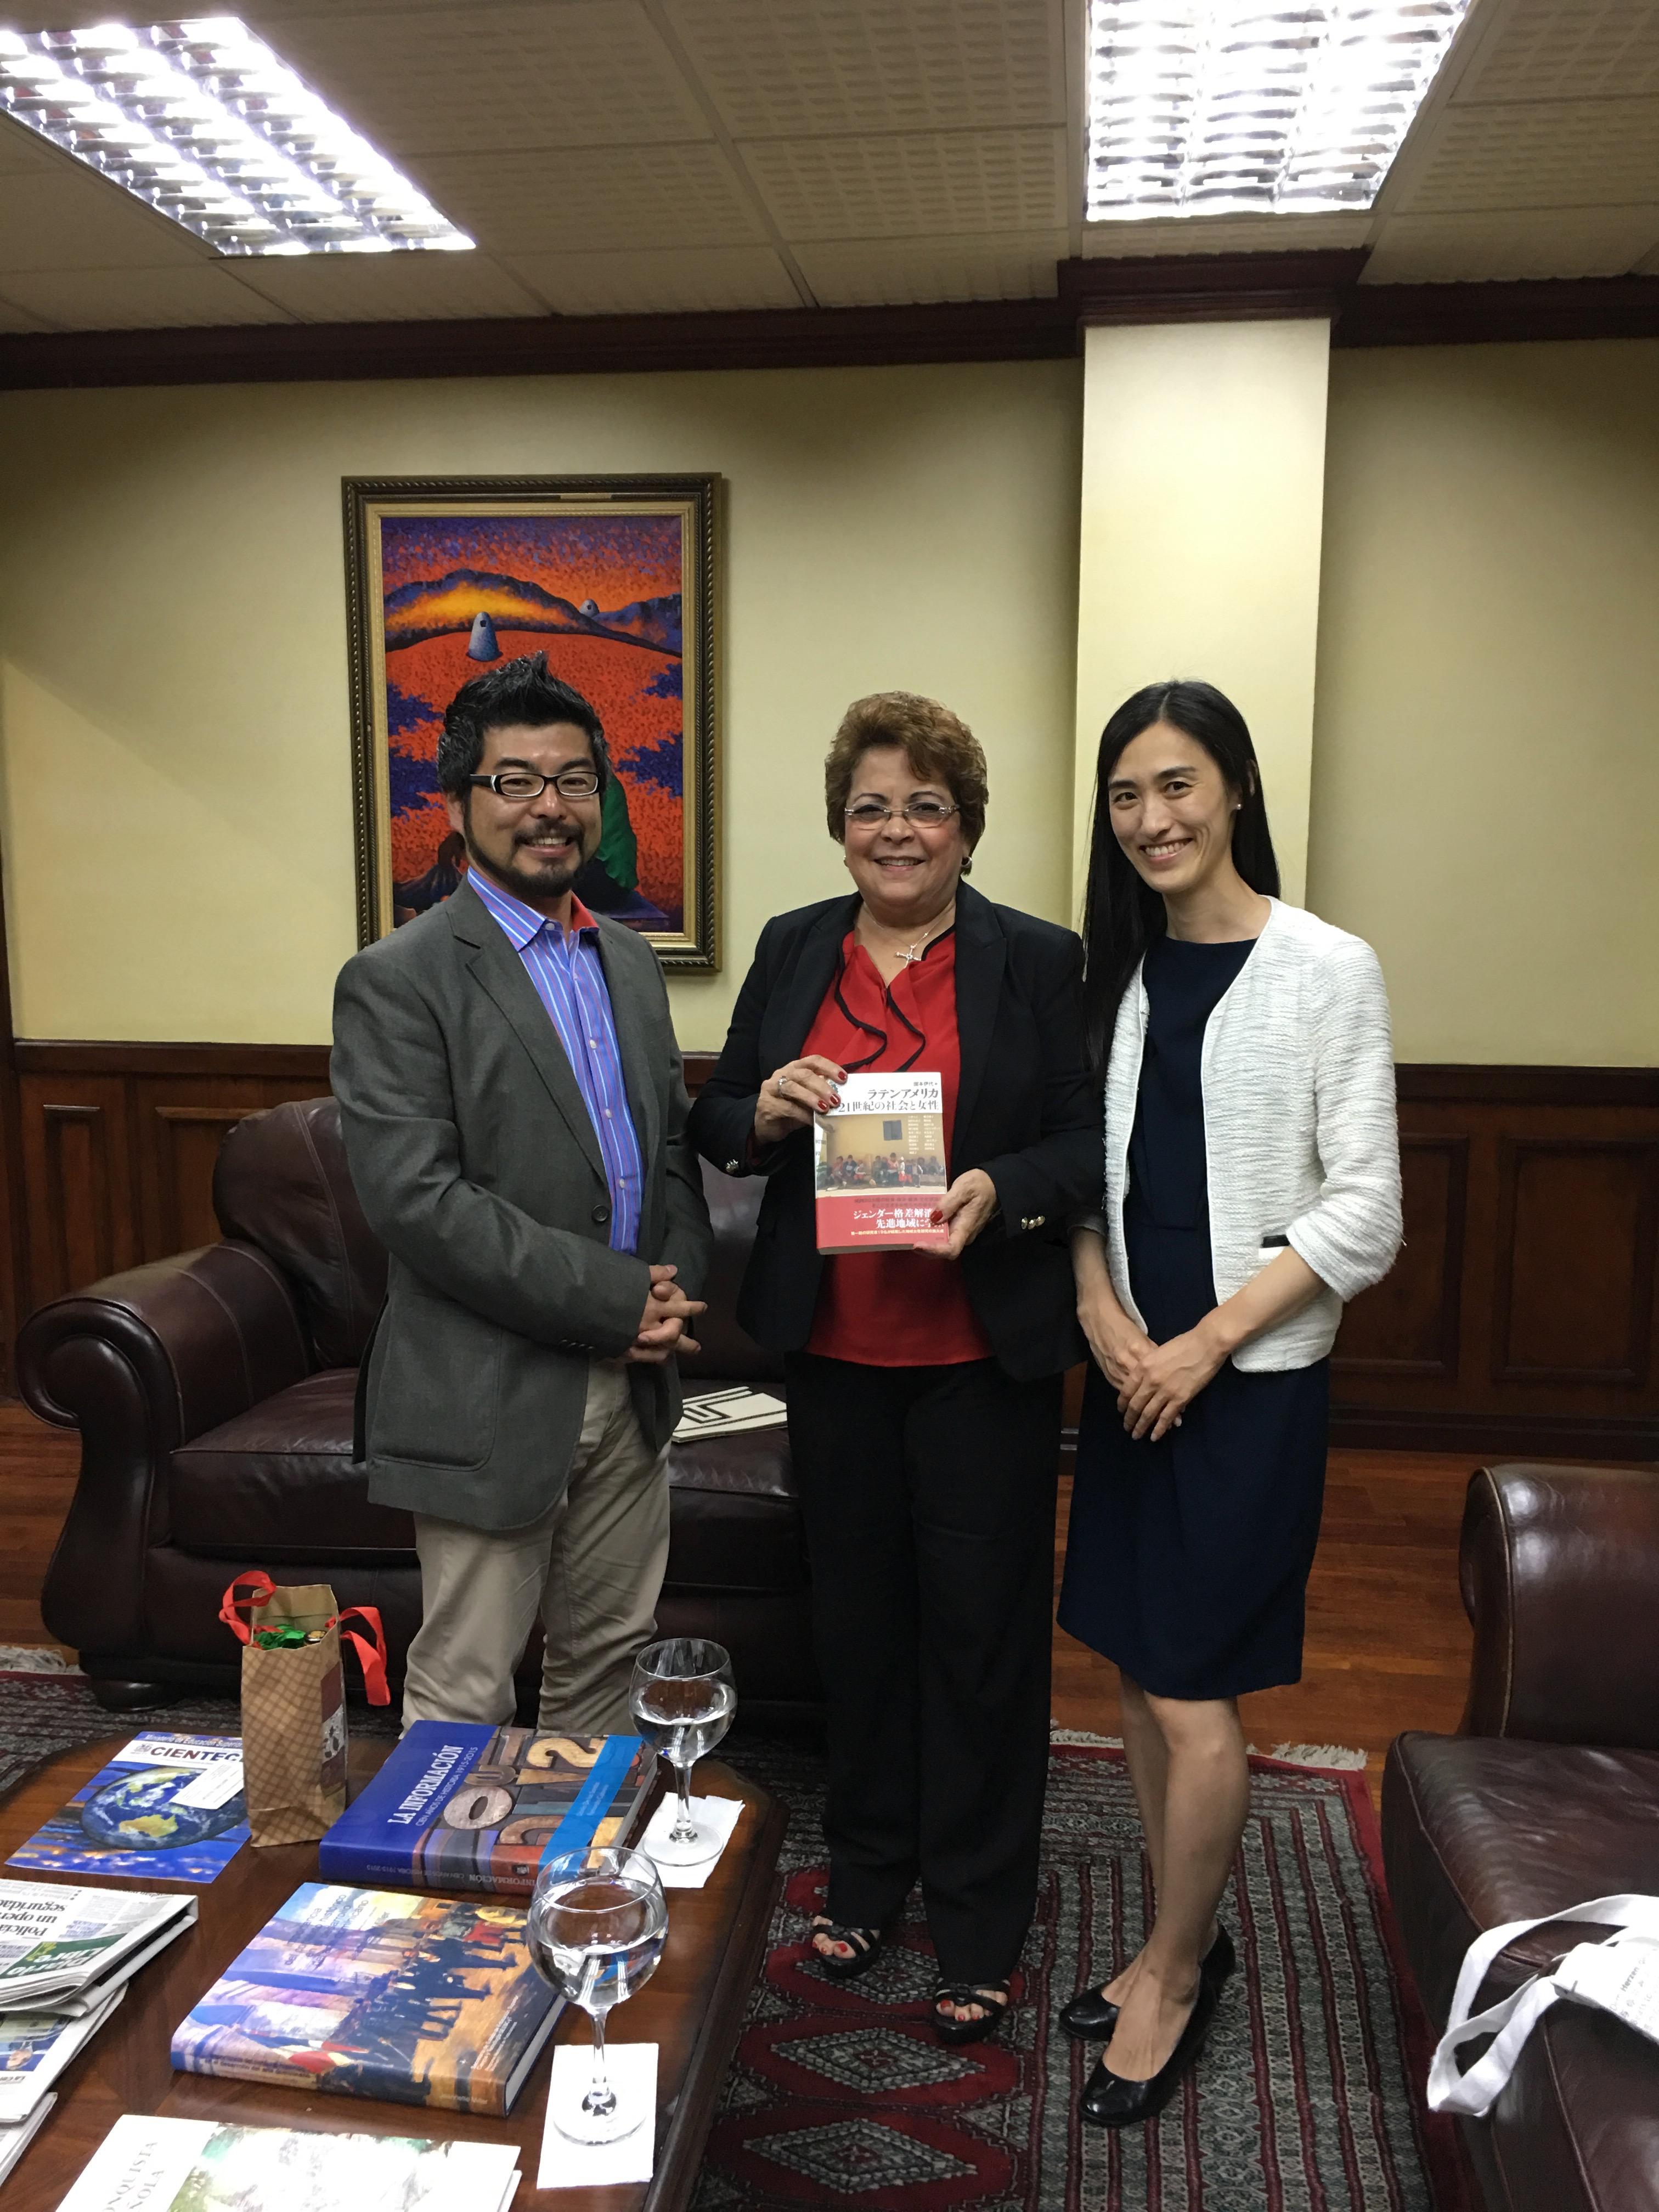 ヘルマン高等教育・科学技術省大臣と面会(Reunión con Sra. Alejandrina Germán, Ministra de Educación Superior, Ciencia y Tecnología)